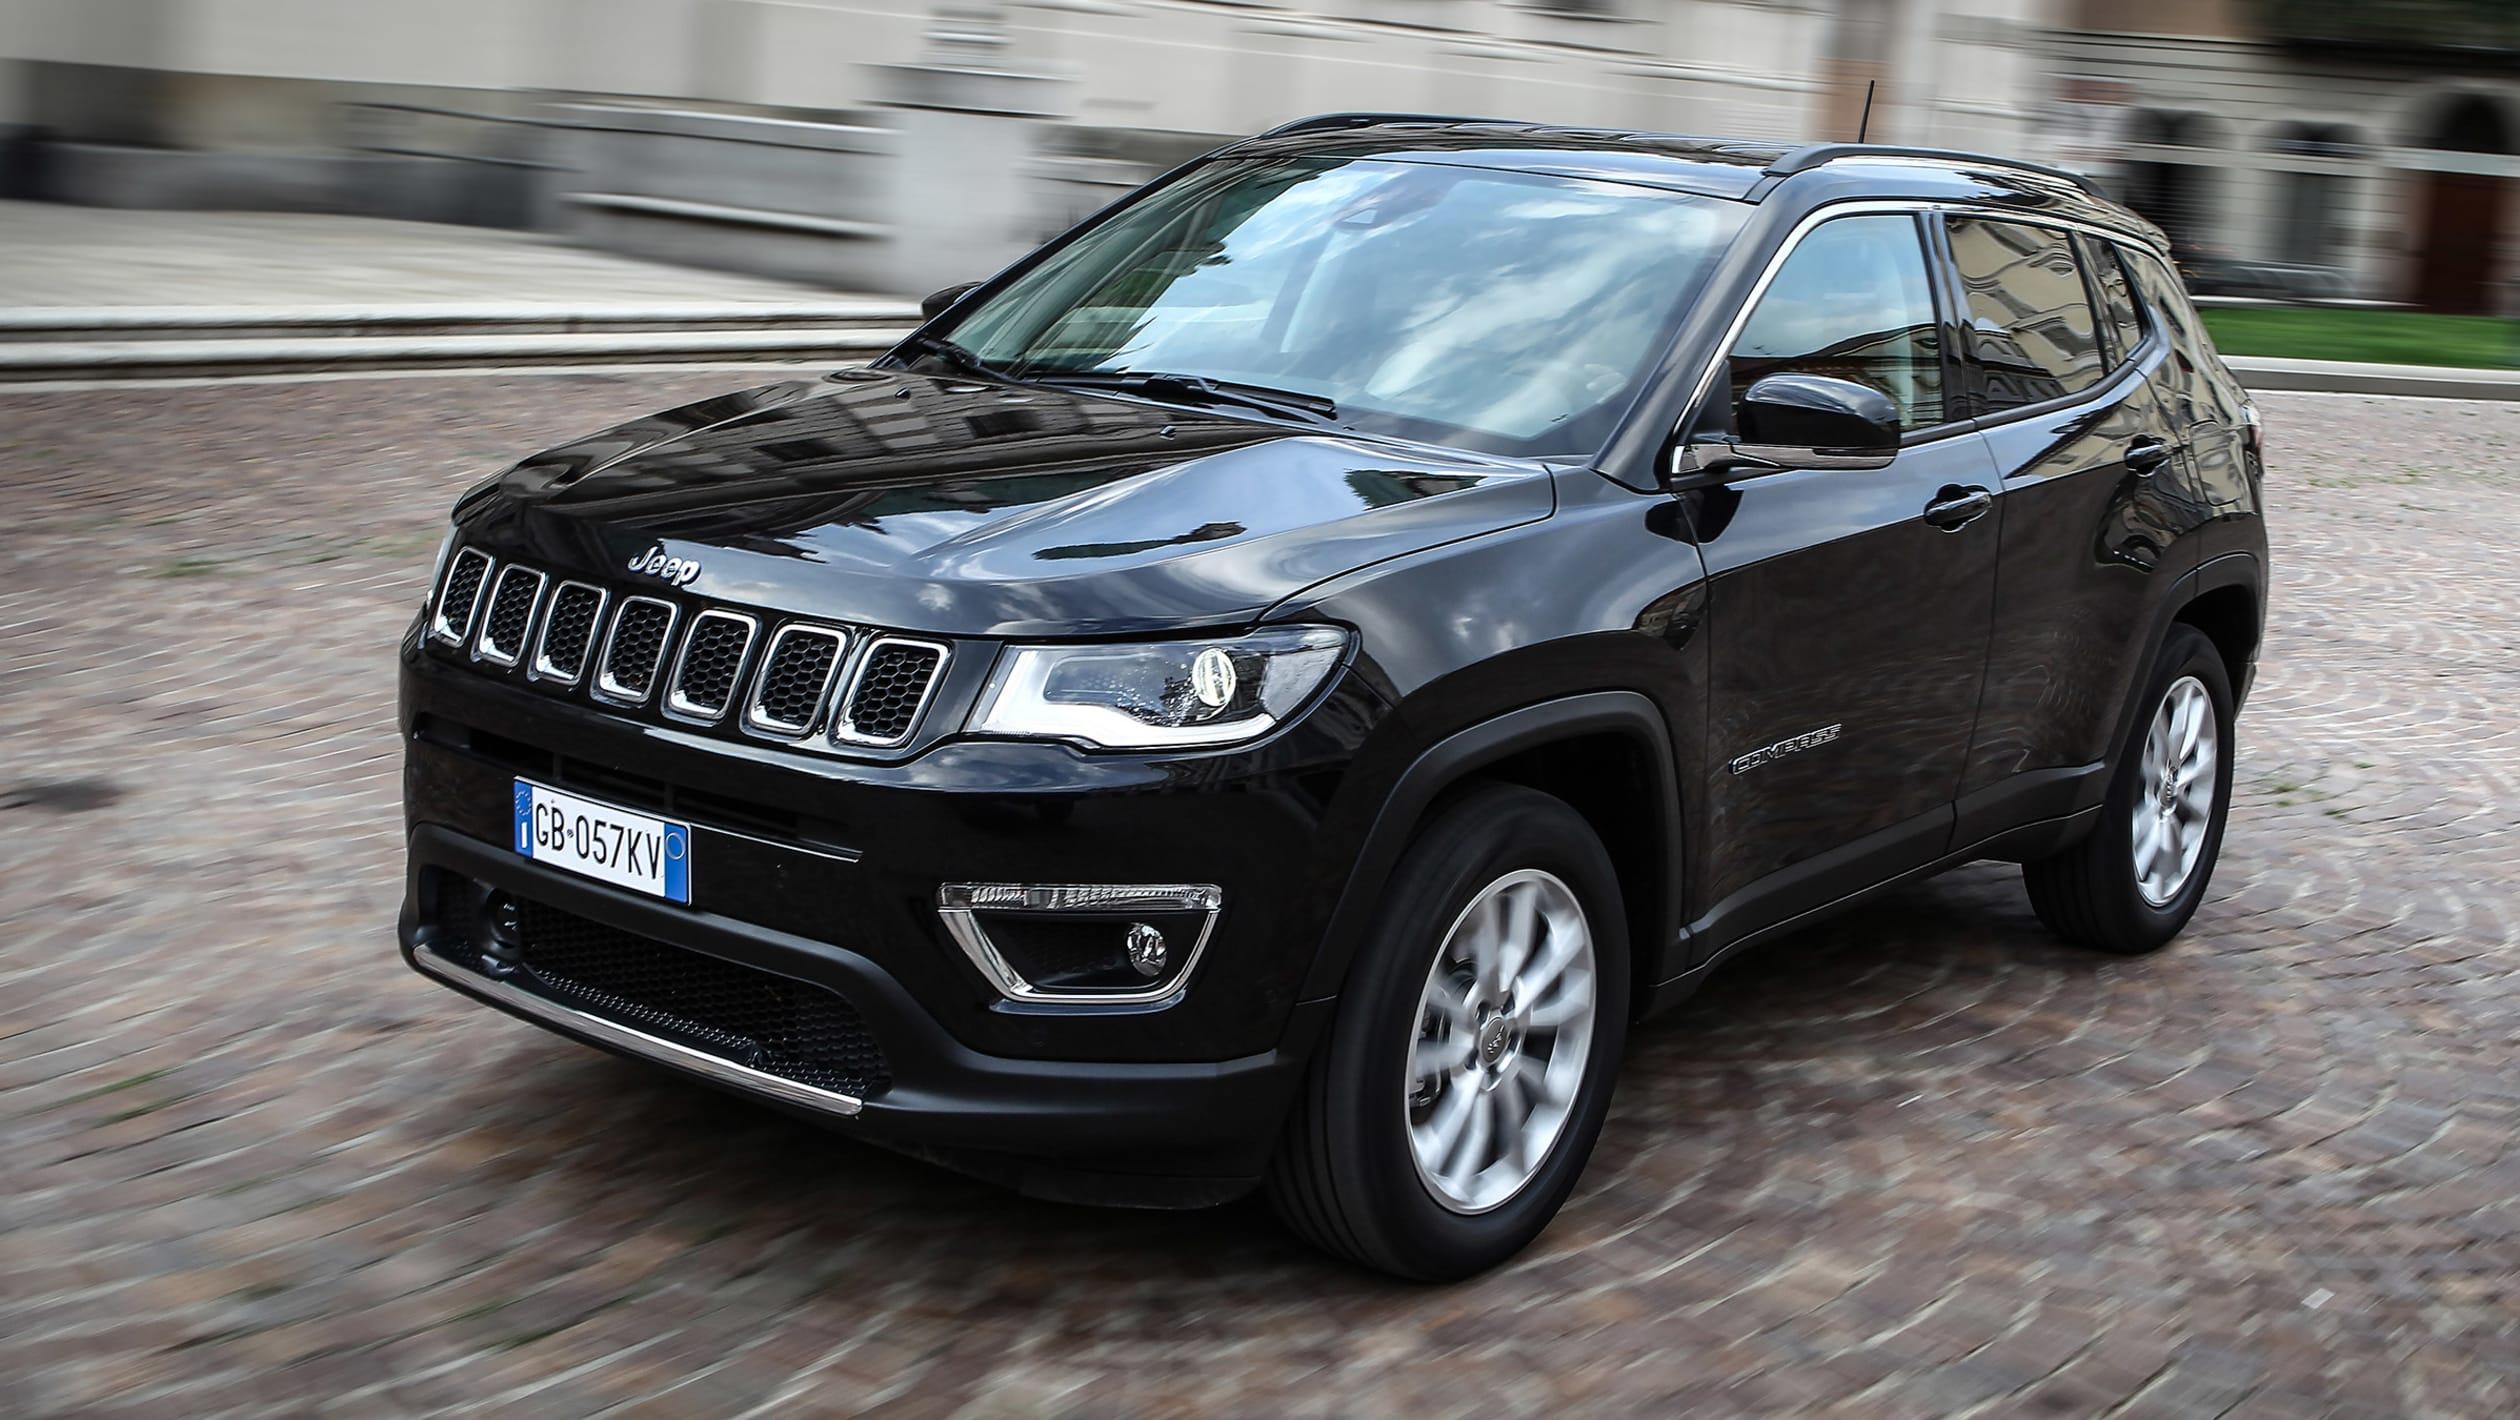 2016 - [Jeep] Compass II - Page 6 Jeep%20Compass%204xe%202020-5